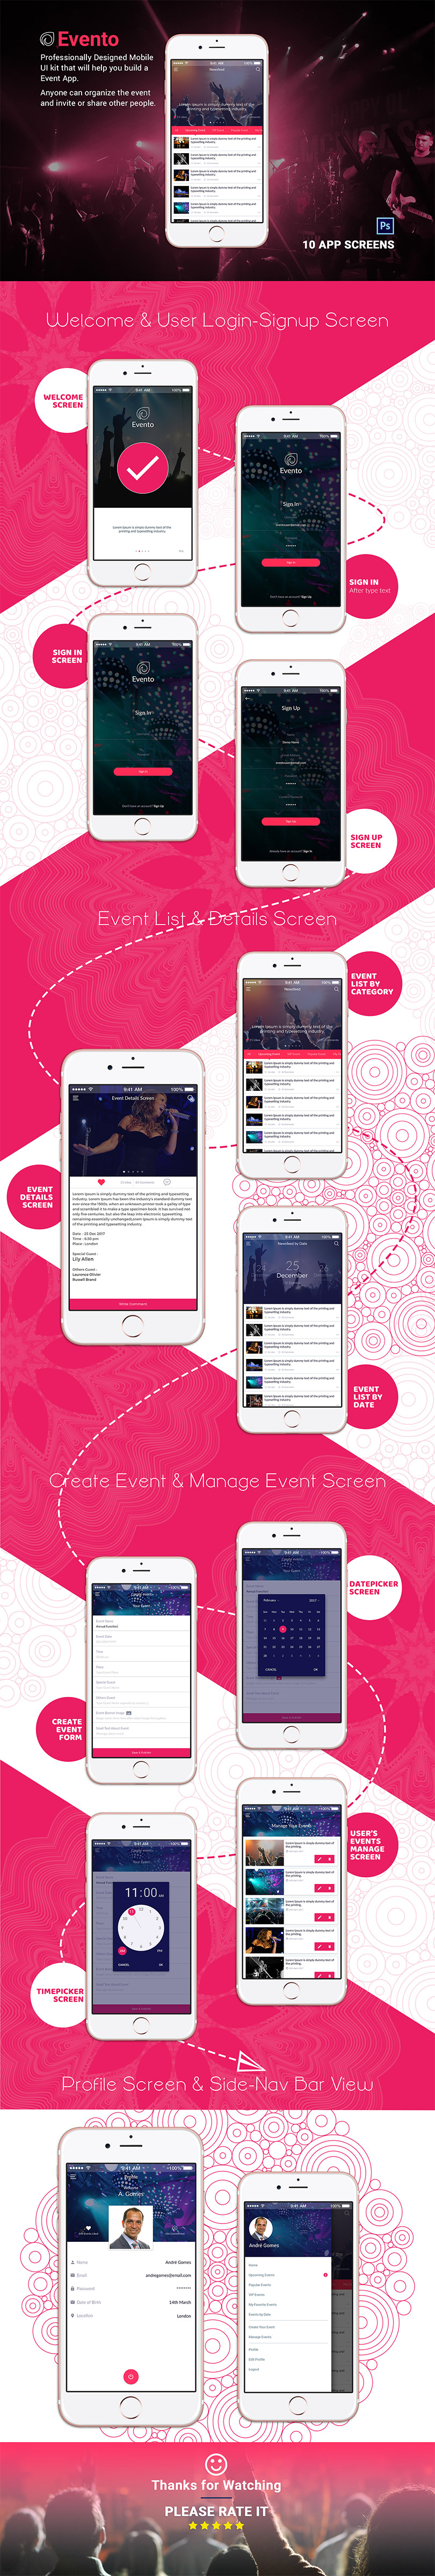 Event Mobile App Design | EVENTO | Free Download | Designpex